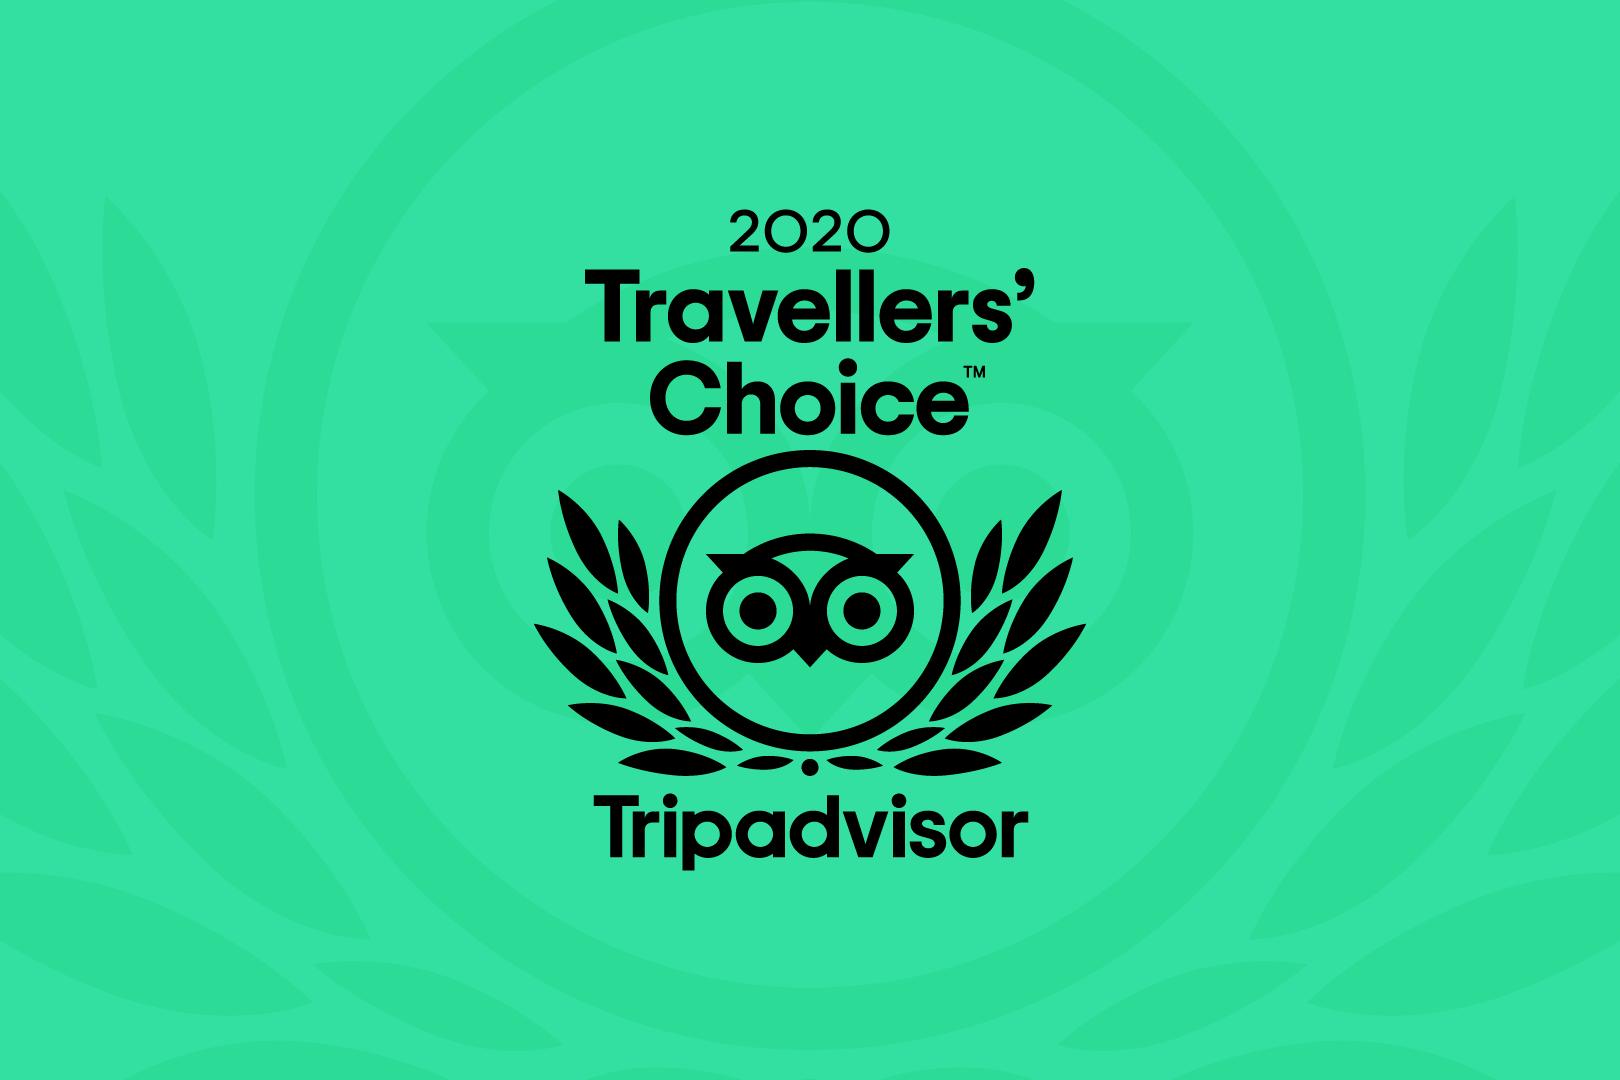 Travellers Choice Nissei 2020